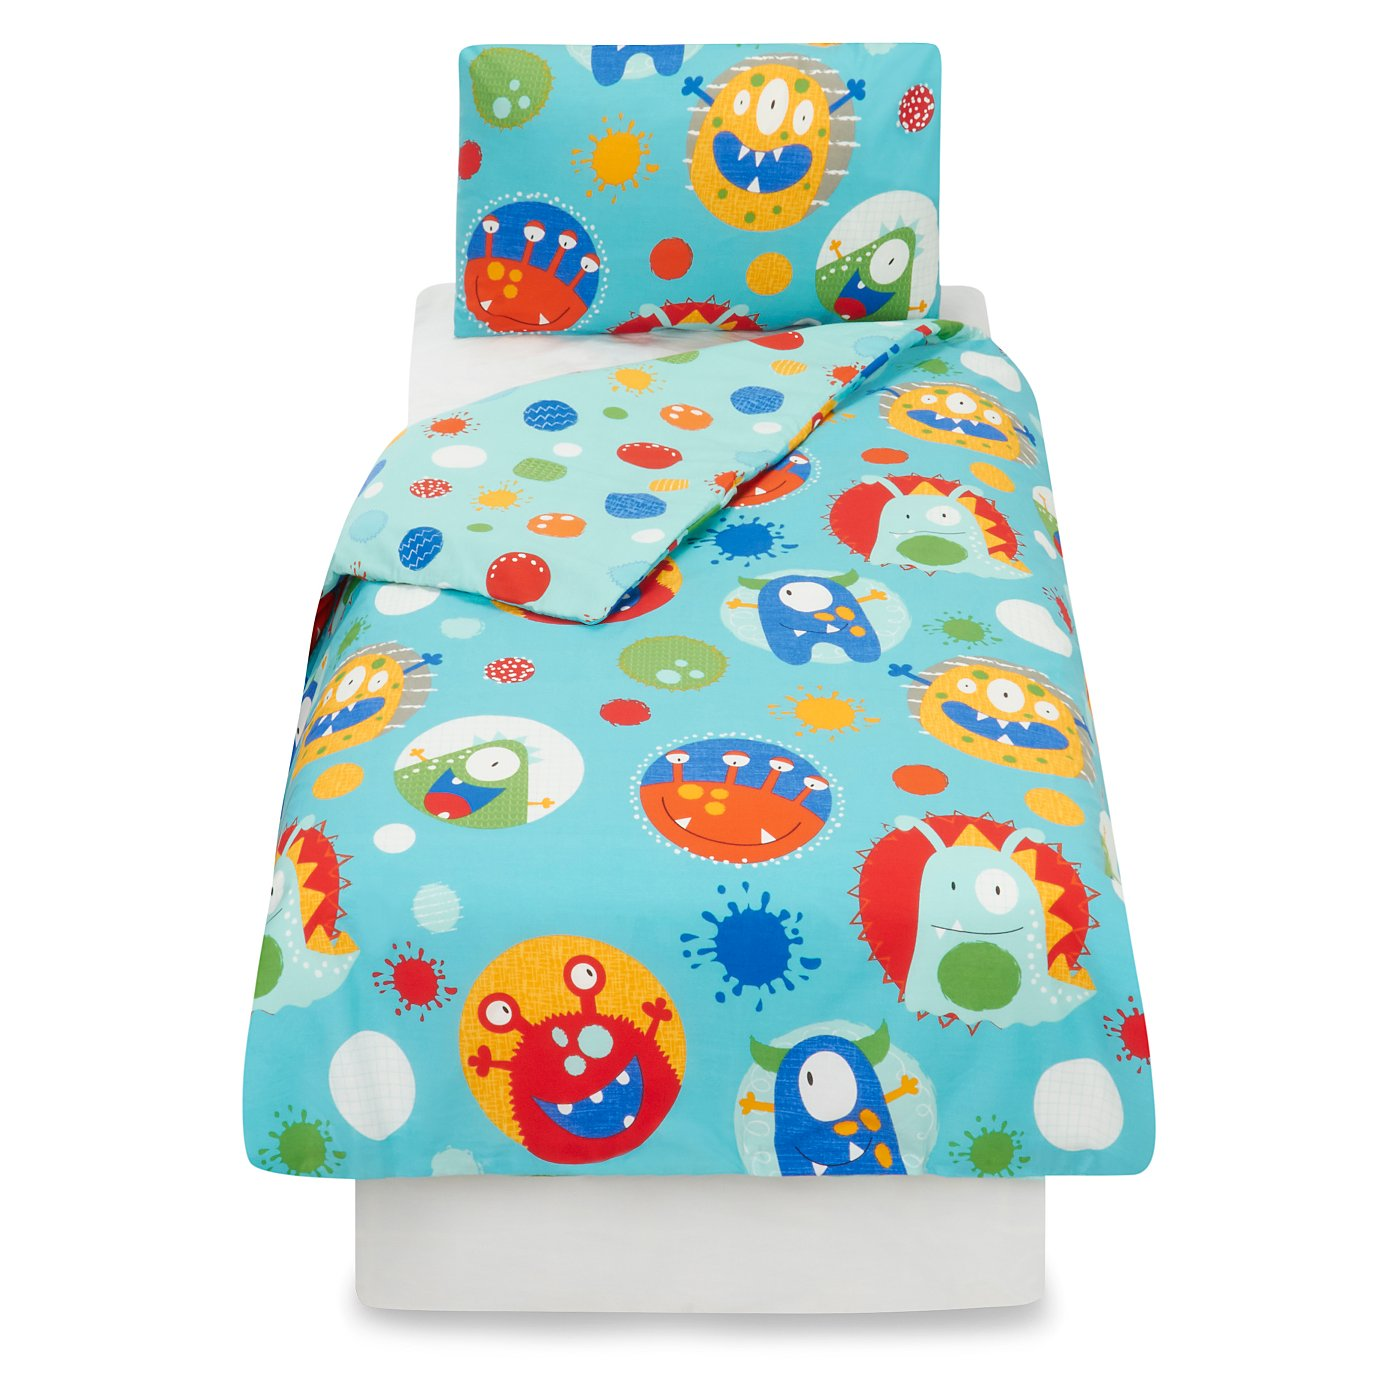 Monster Toddler Bedding Range | Bedding | George at ASDA